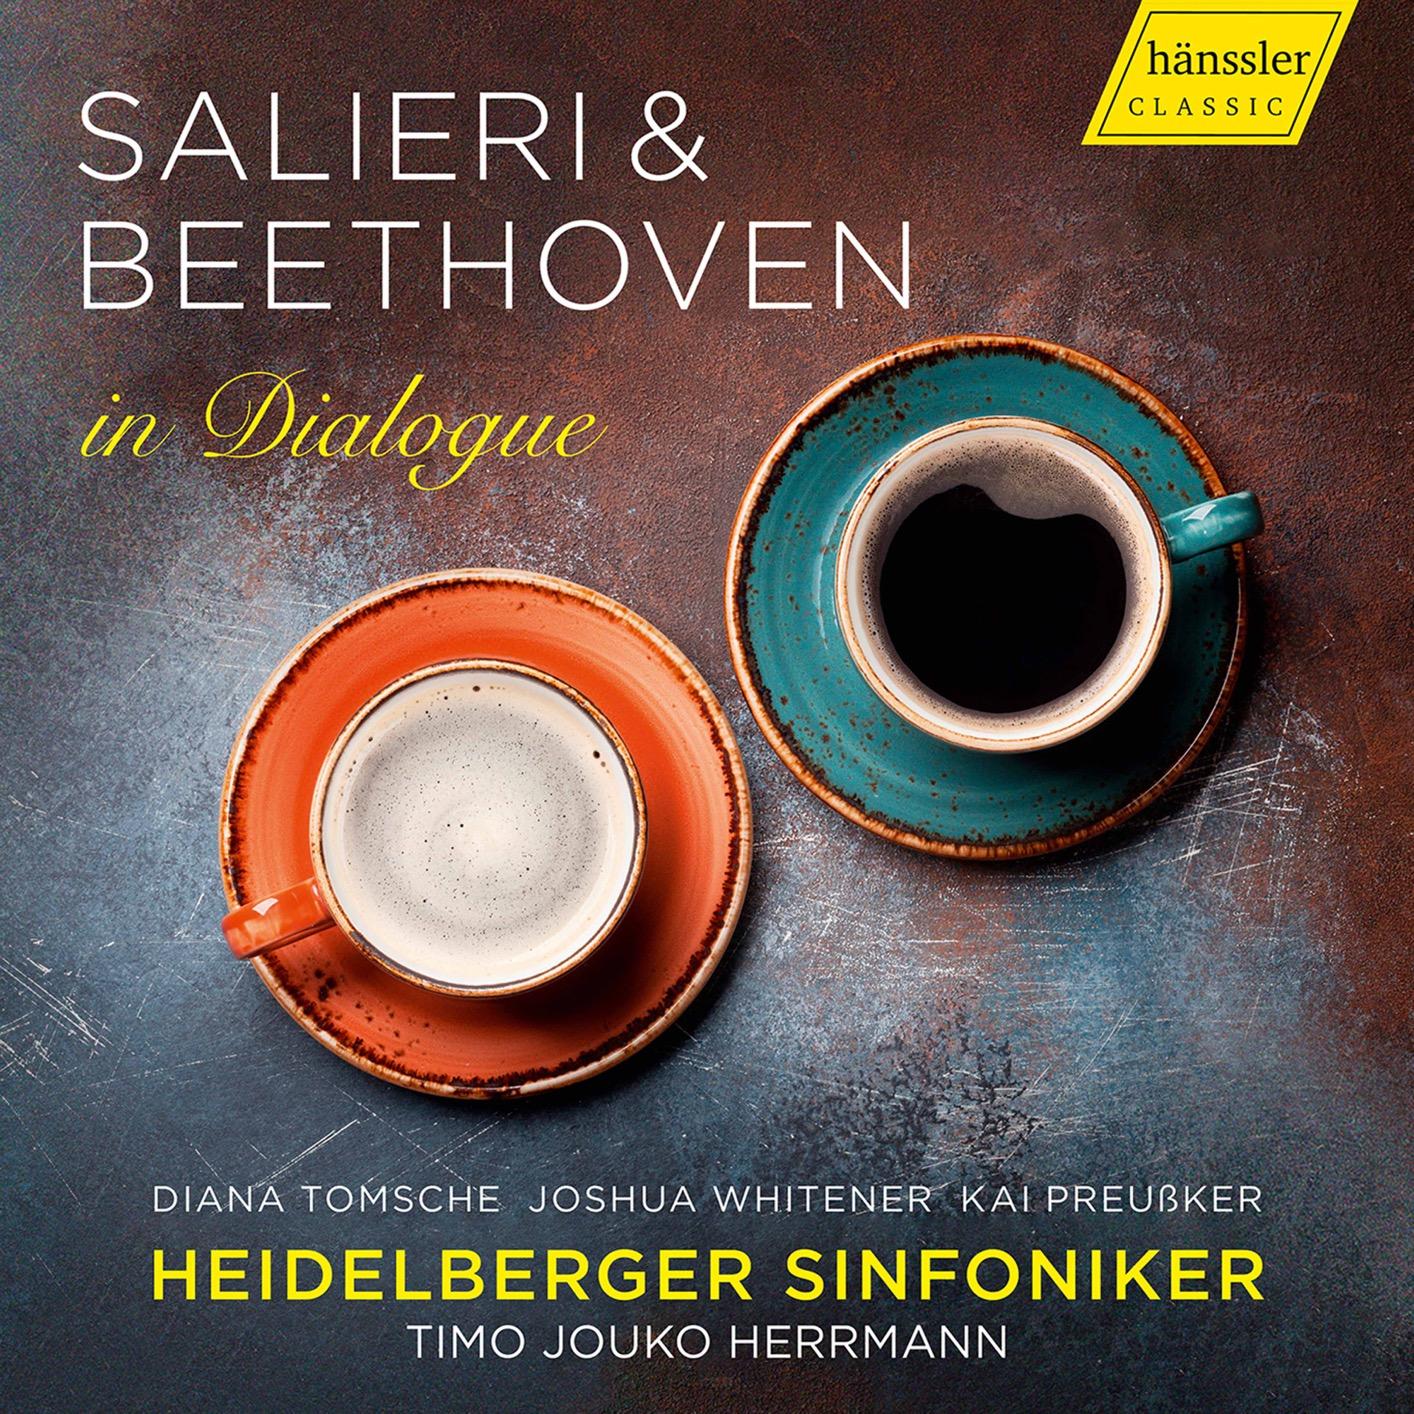 Salieri & Beethoven in Dialogue | HIGHRESAUDIO